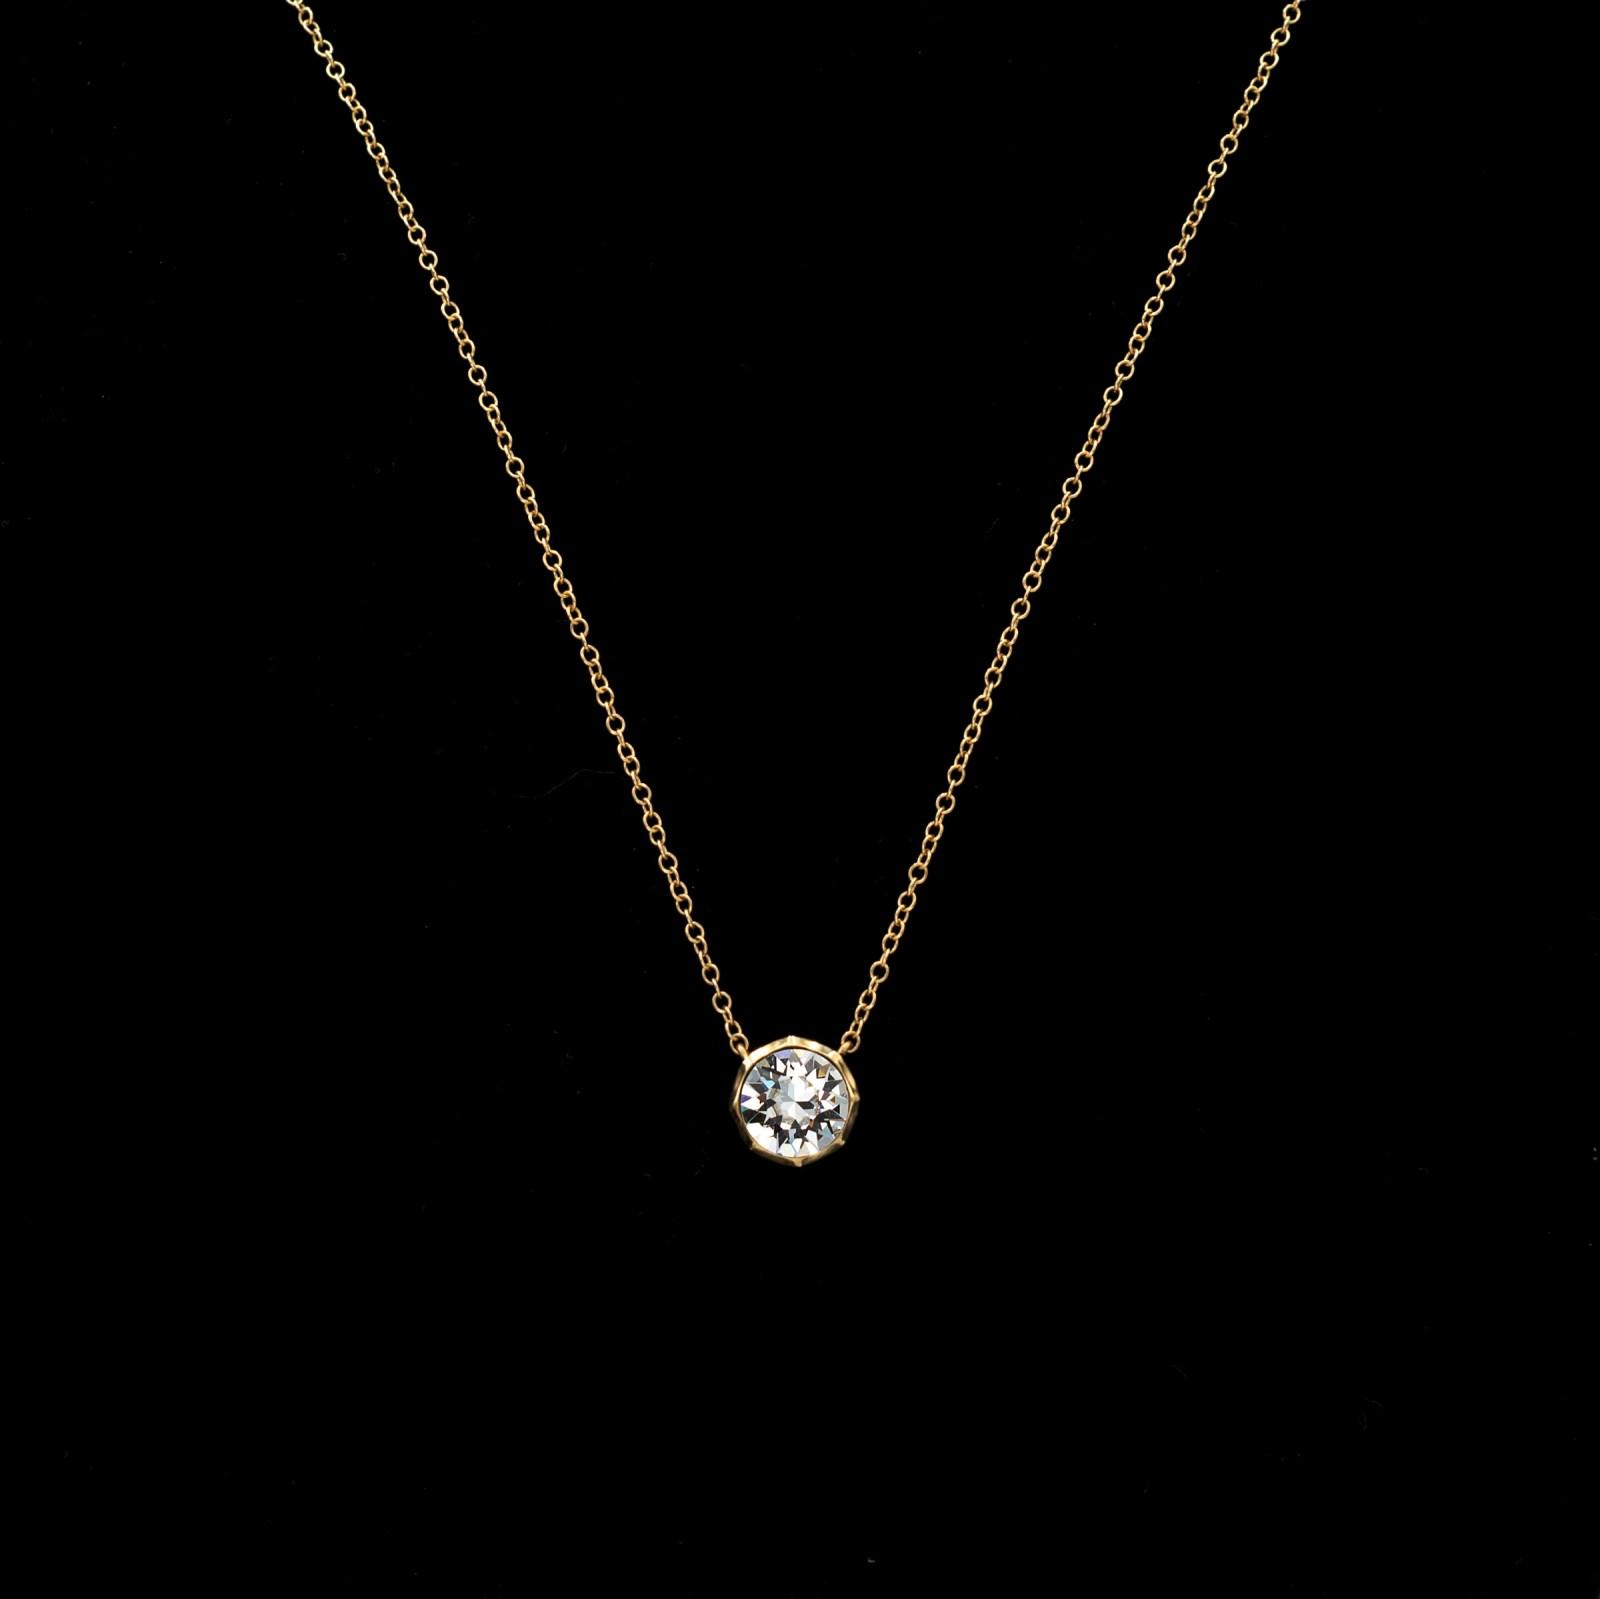 Revival Paste 14K Gold Small Paste Solitaire Necklace